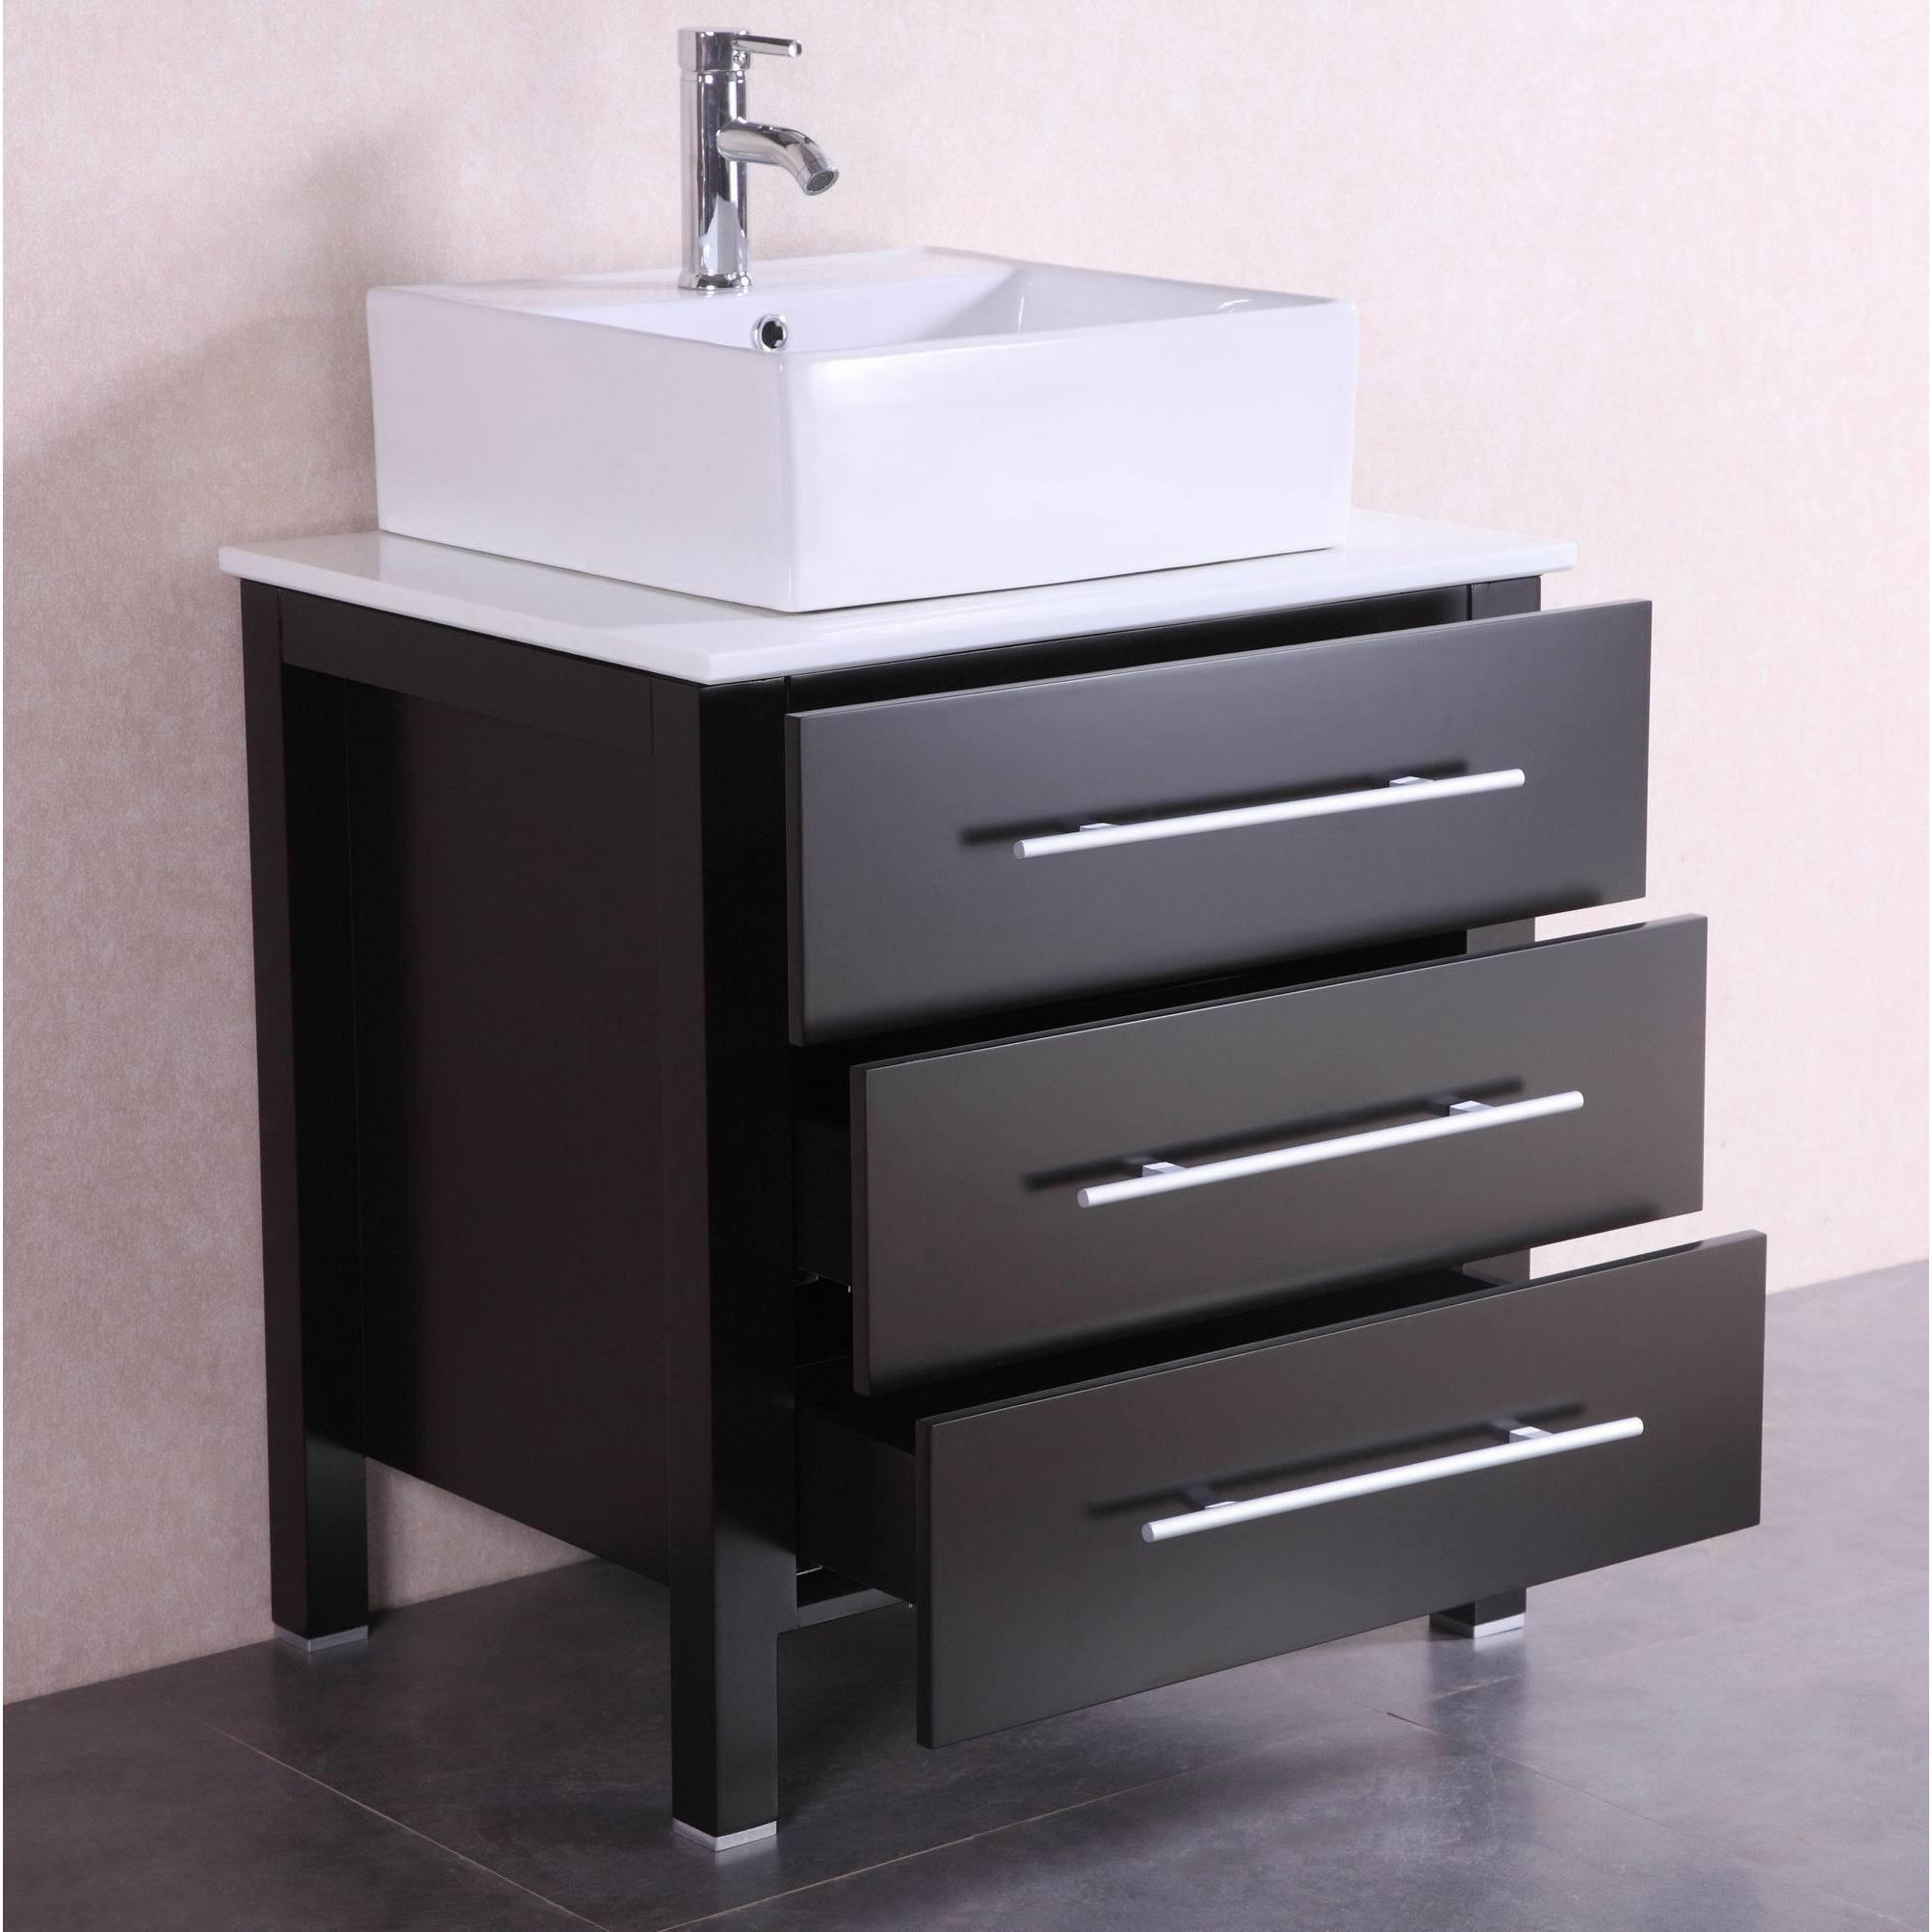 Shop 28 inch belvedere modern freestanding espresso bathroom vanity w vessel sink free shipping today overstock com 13464483